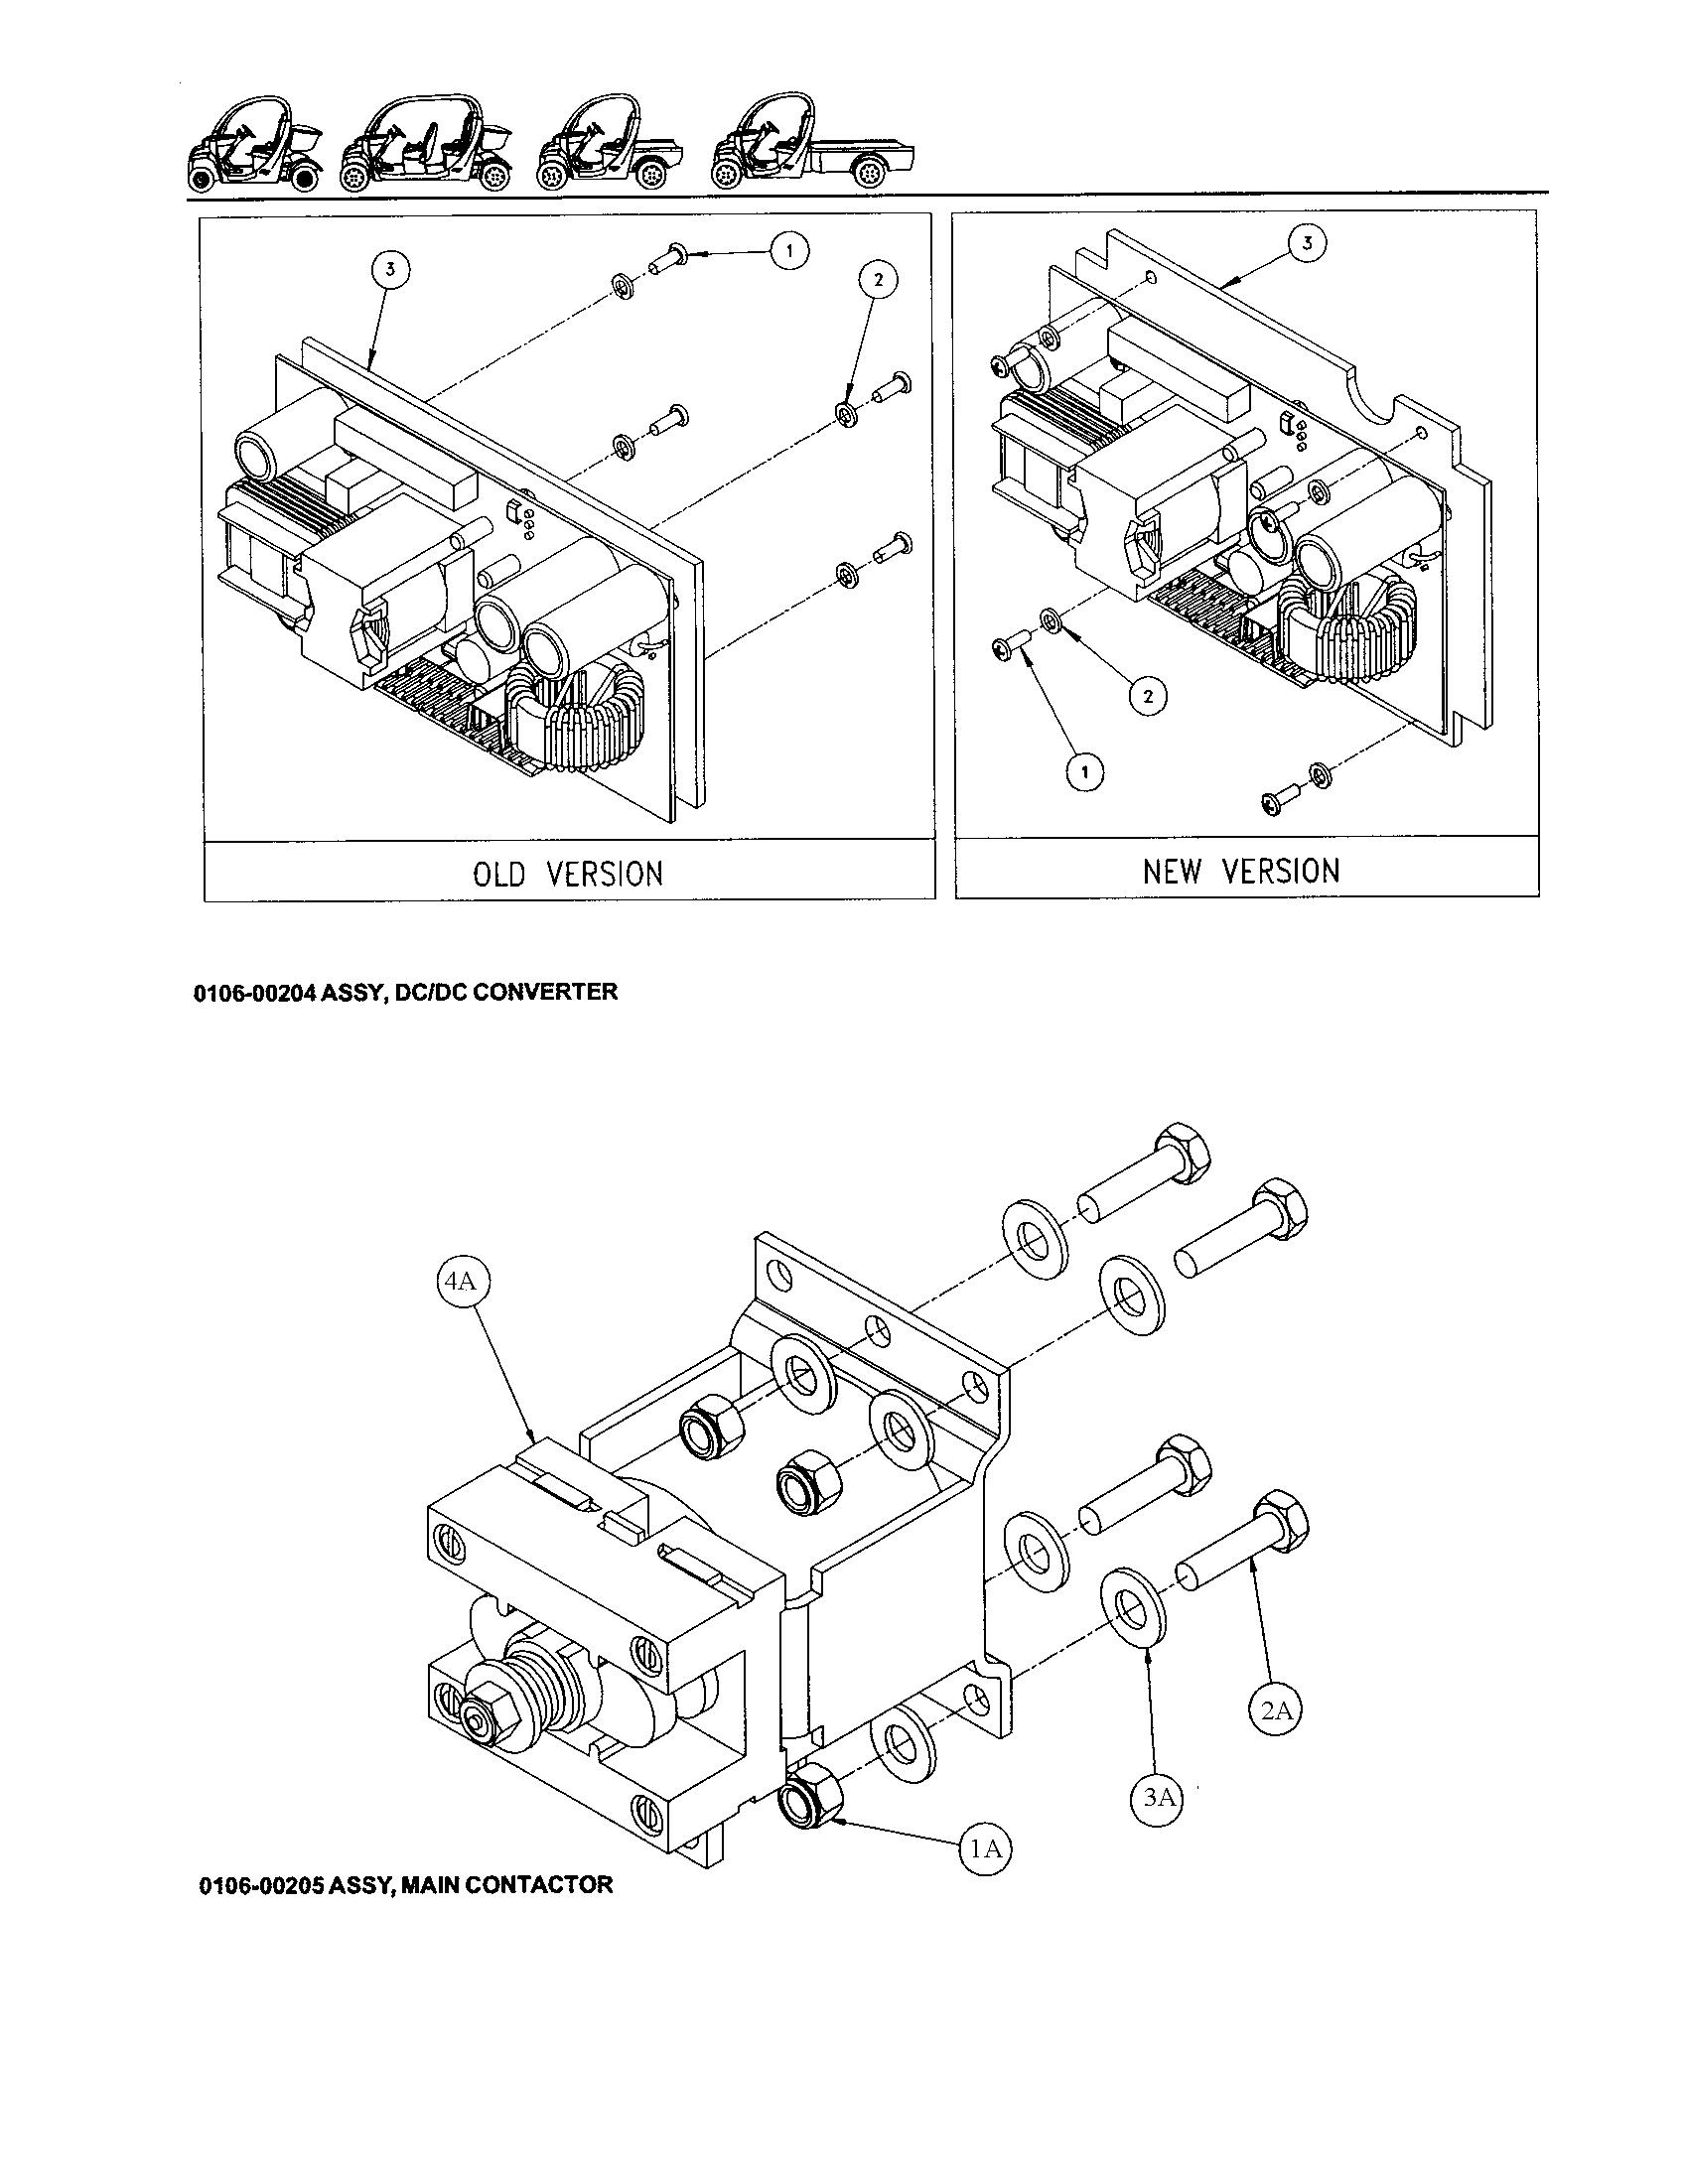 Battery Wiring Diagram For A Gem E825 Gem Car Wiring